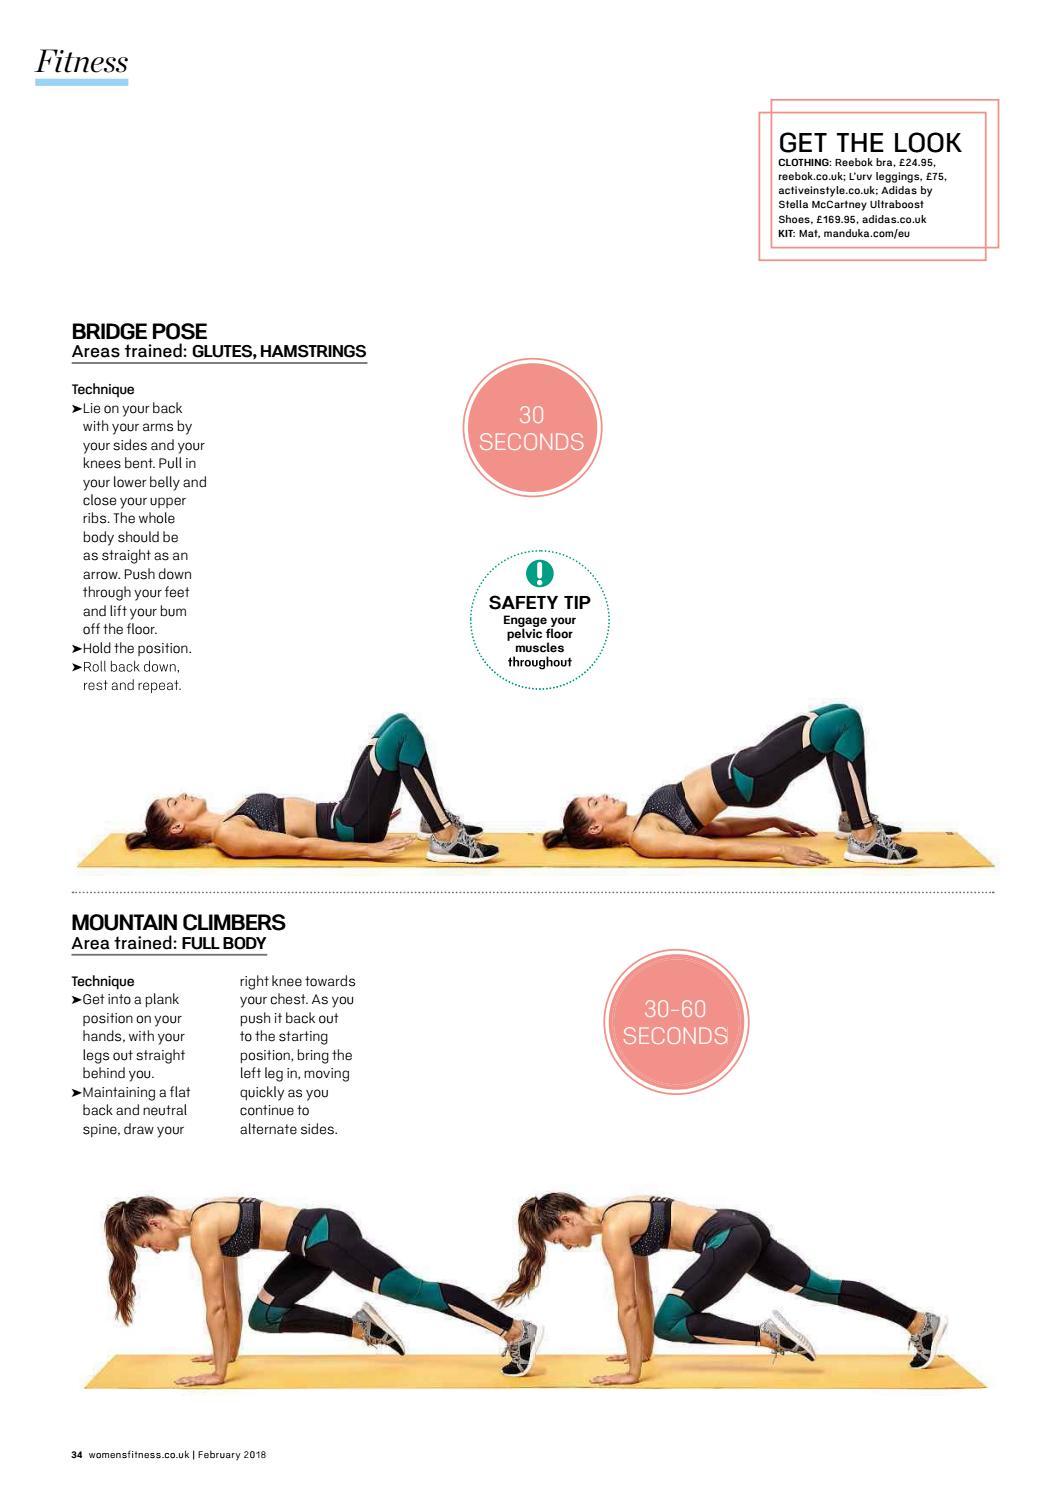 romano Creación Saltar  Women fitness uk february 2018 by nguyenducthanhminh - issuu